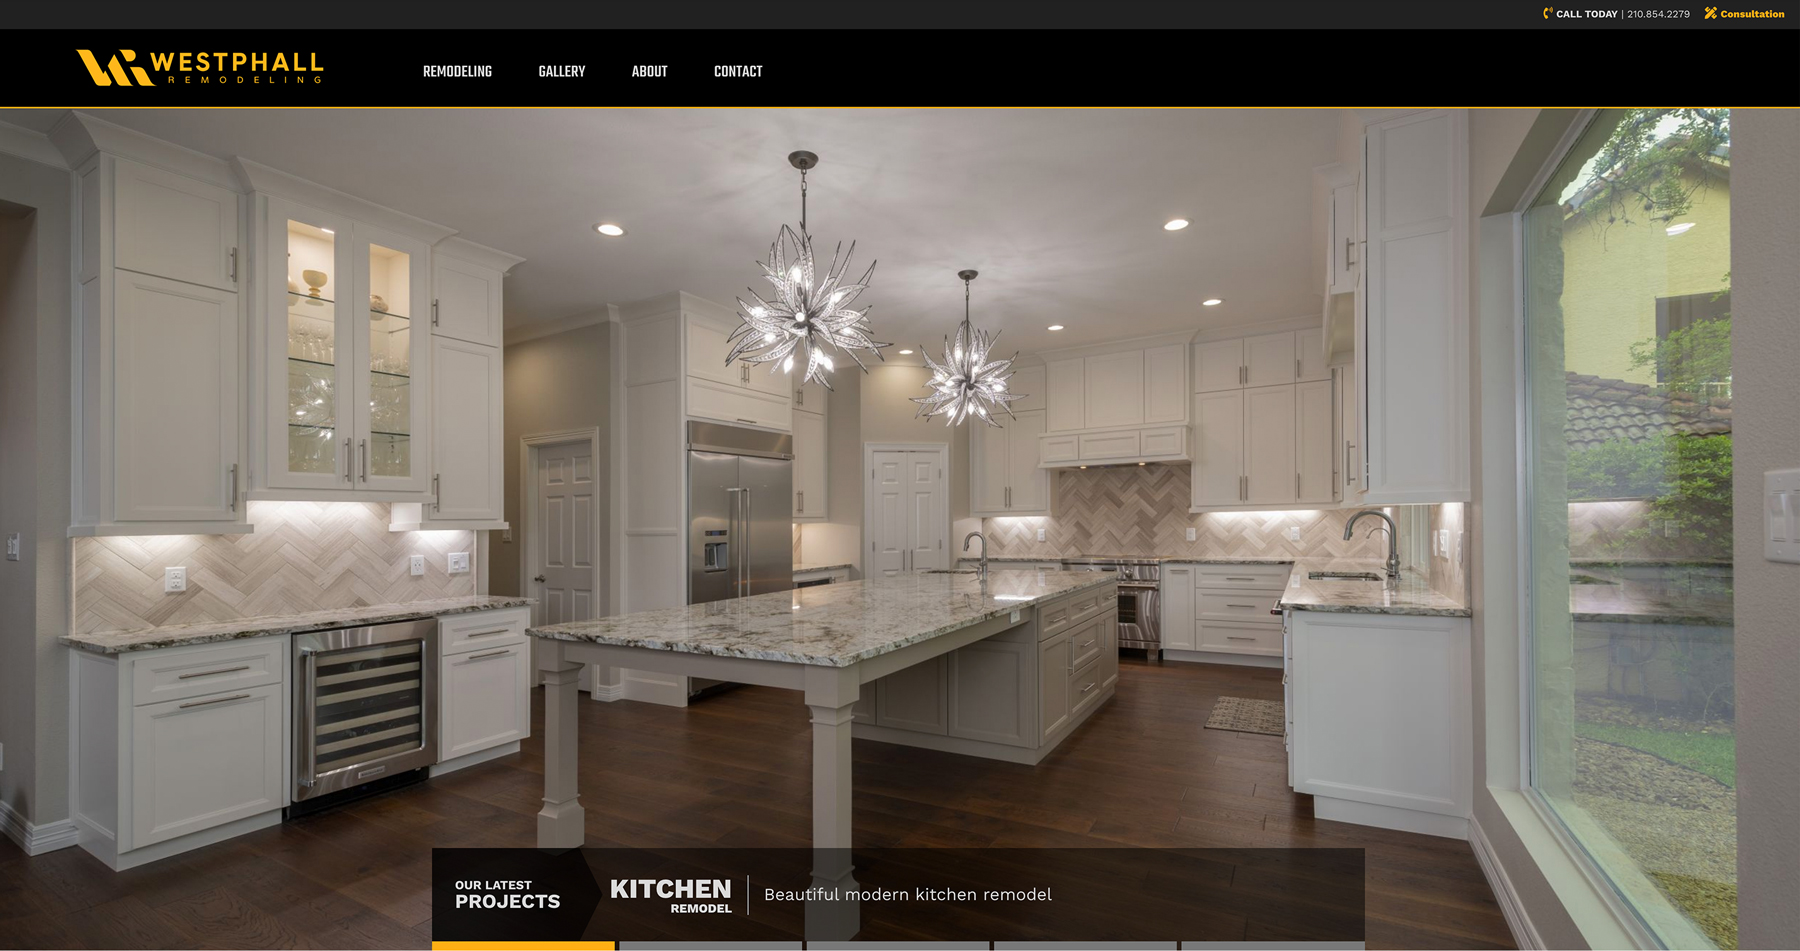 Westphall Remodeling San Antonio Homes Kitchens Additions Bathrooms